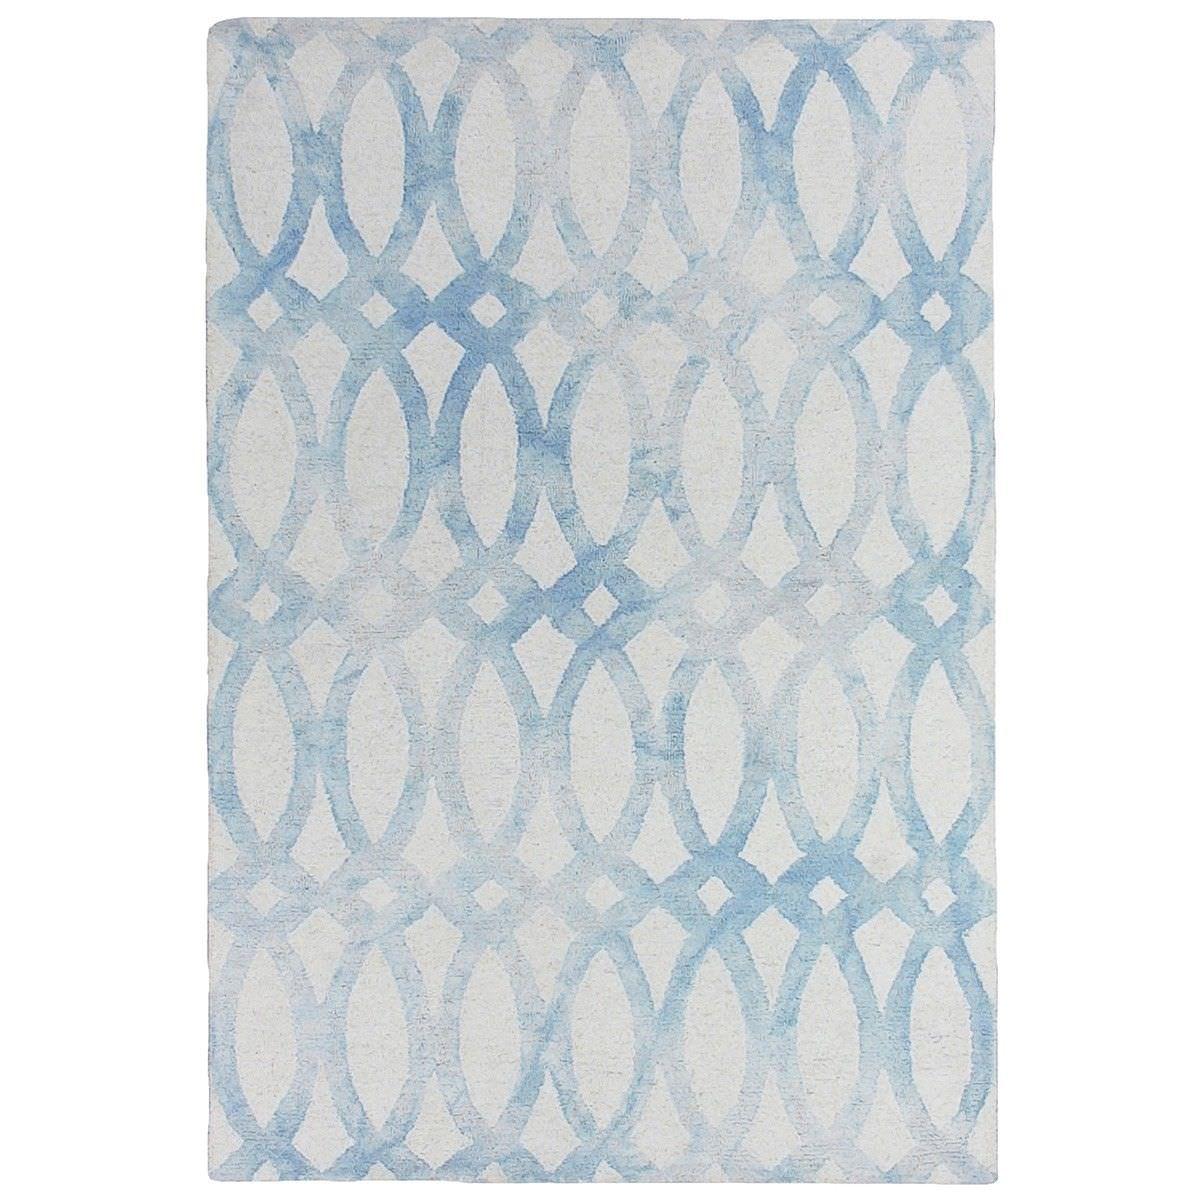 Dip Dye Hand Tufted Wool Rug, 160x230cm, Blue